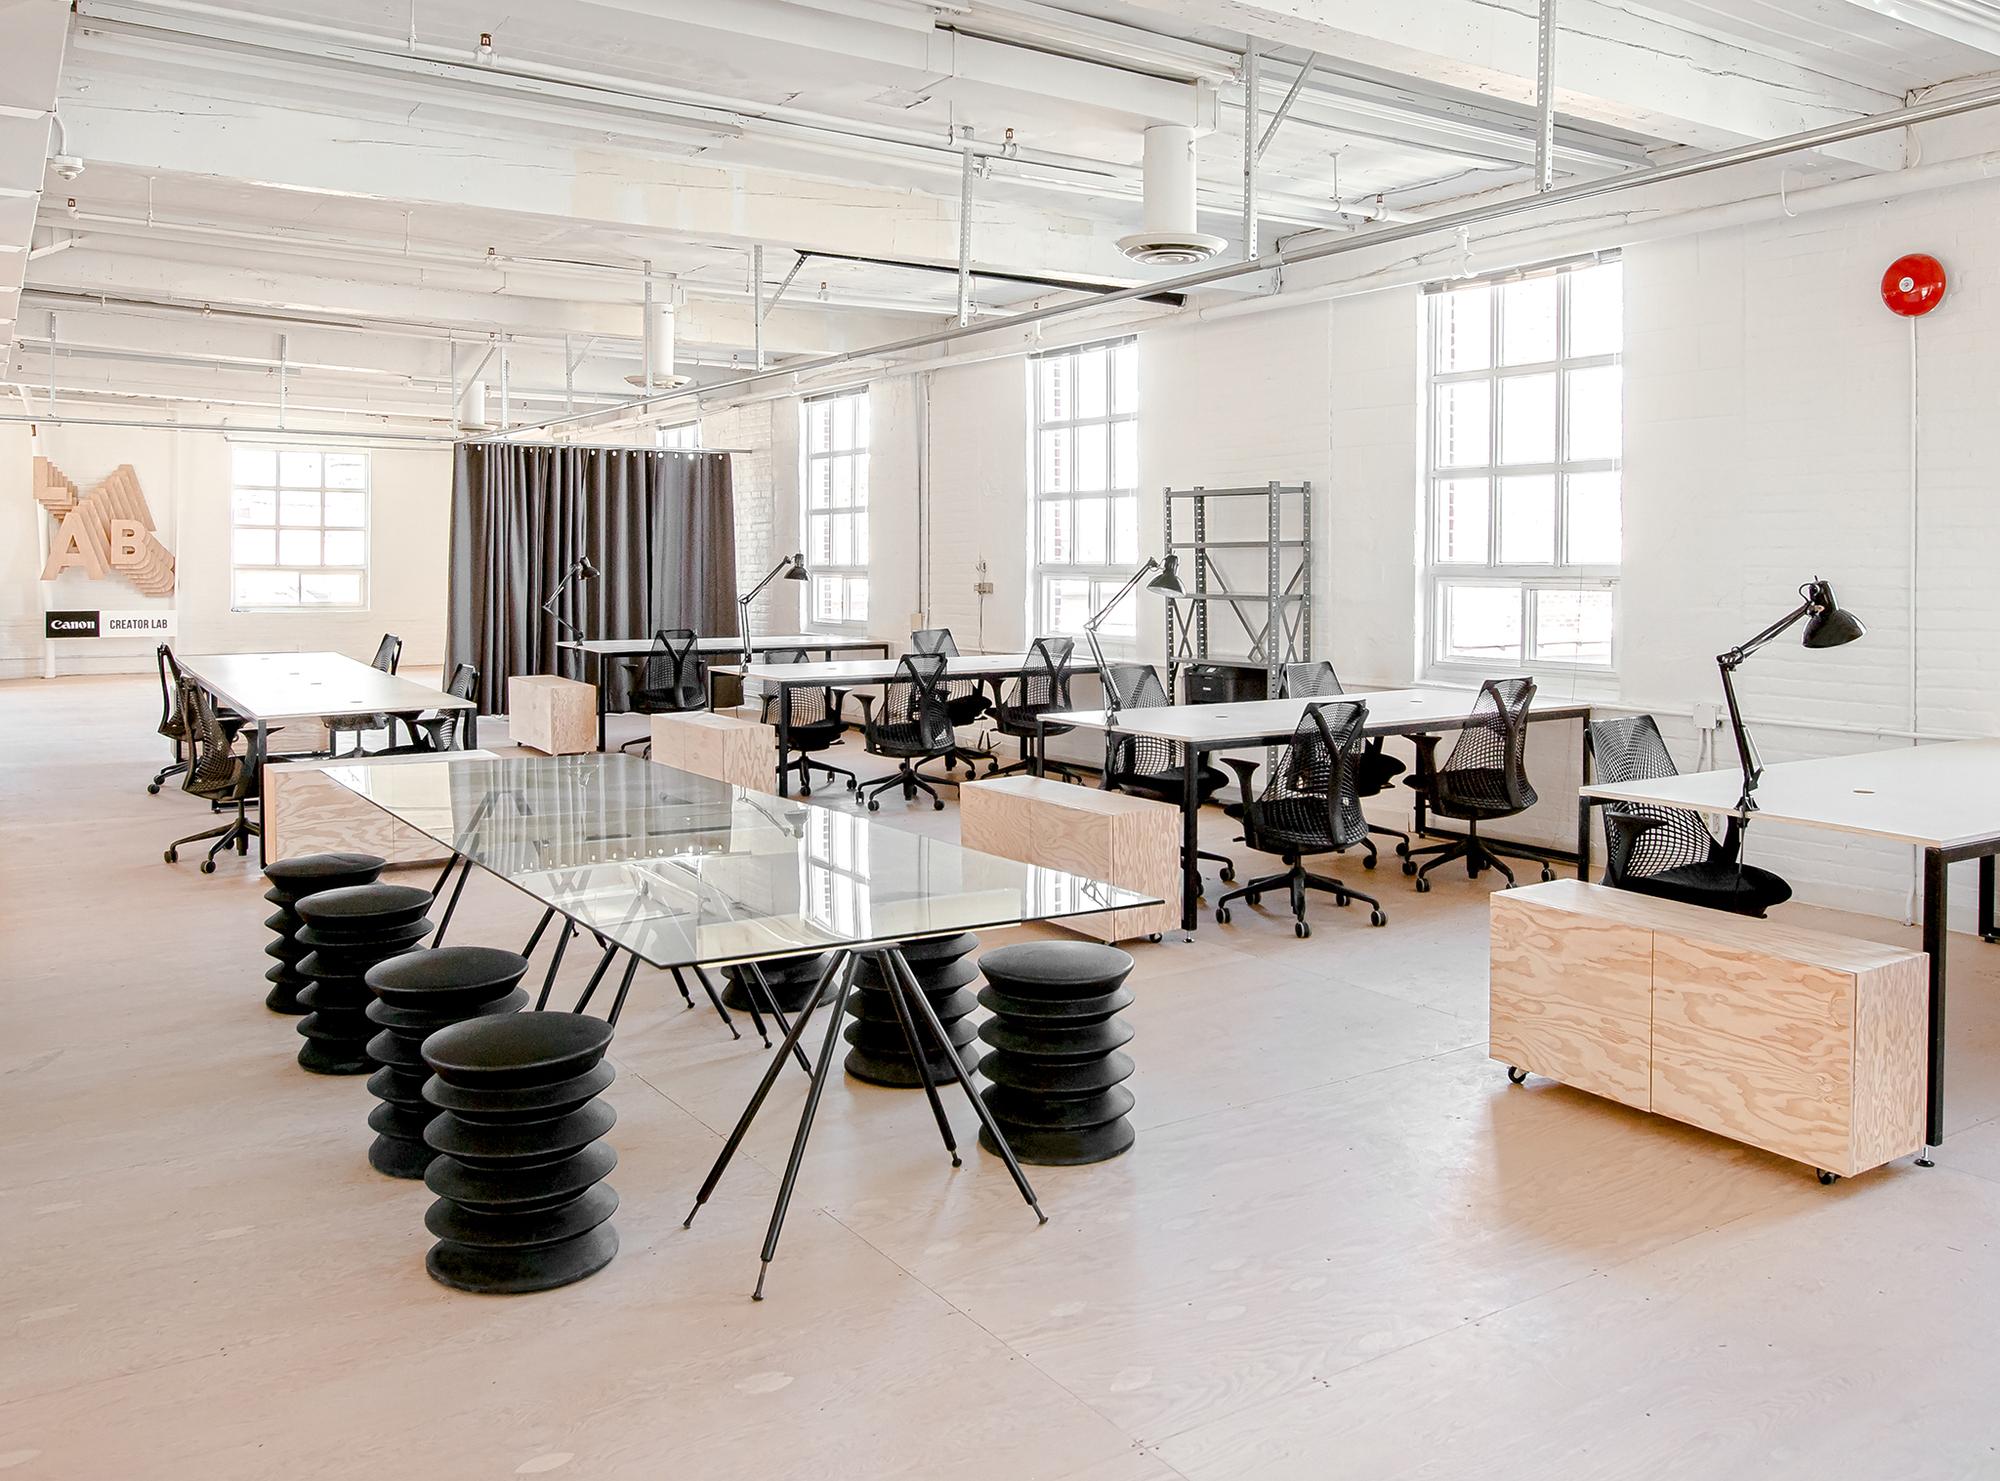 Desain Kantor Minimalis Keren Yang Bikin Kamu Makin Rajin Kerja